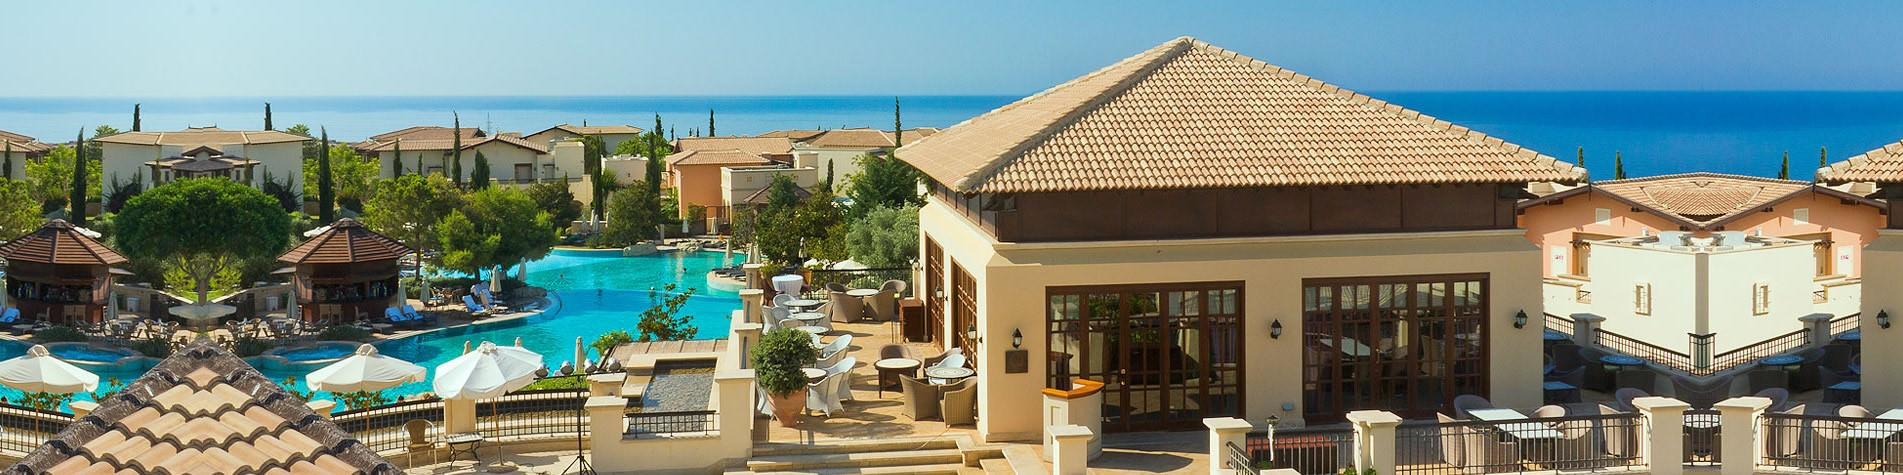 Stunning Aphrodite Hills Resort Holidays